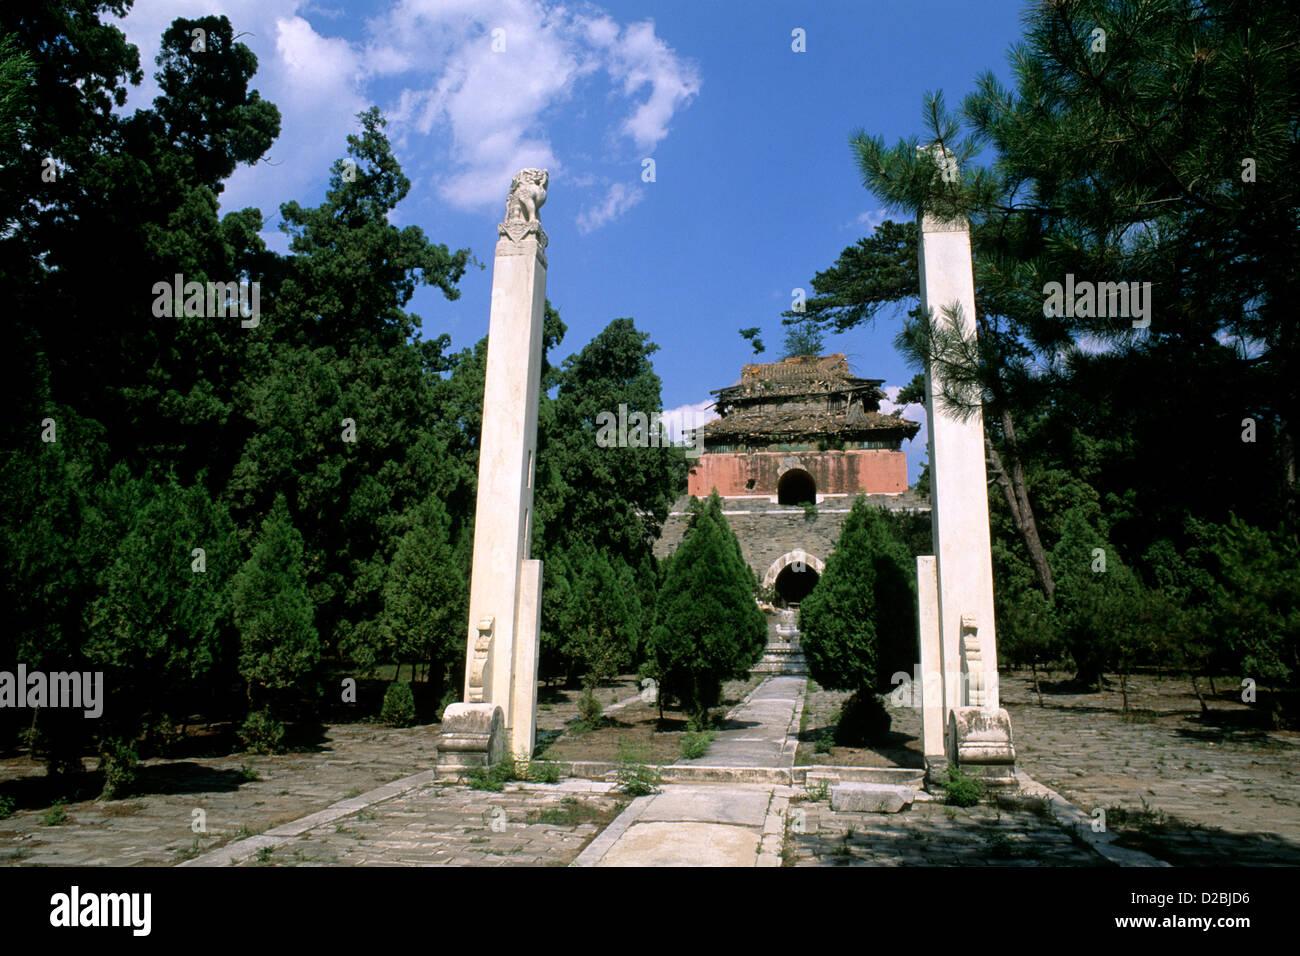 China, Rare Ming Tomb At Deling Tomb - Stock Image